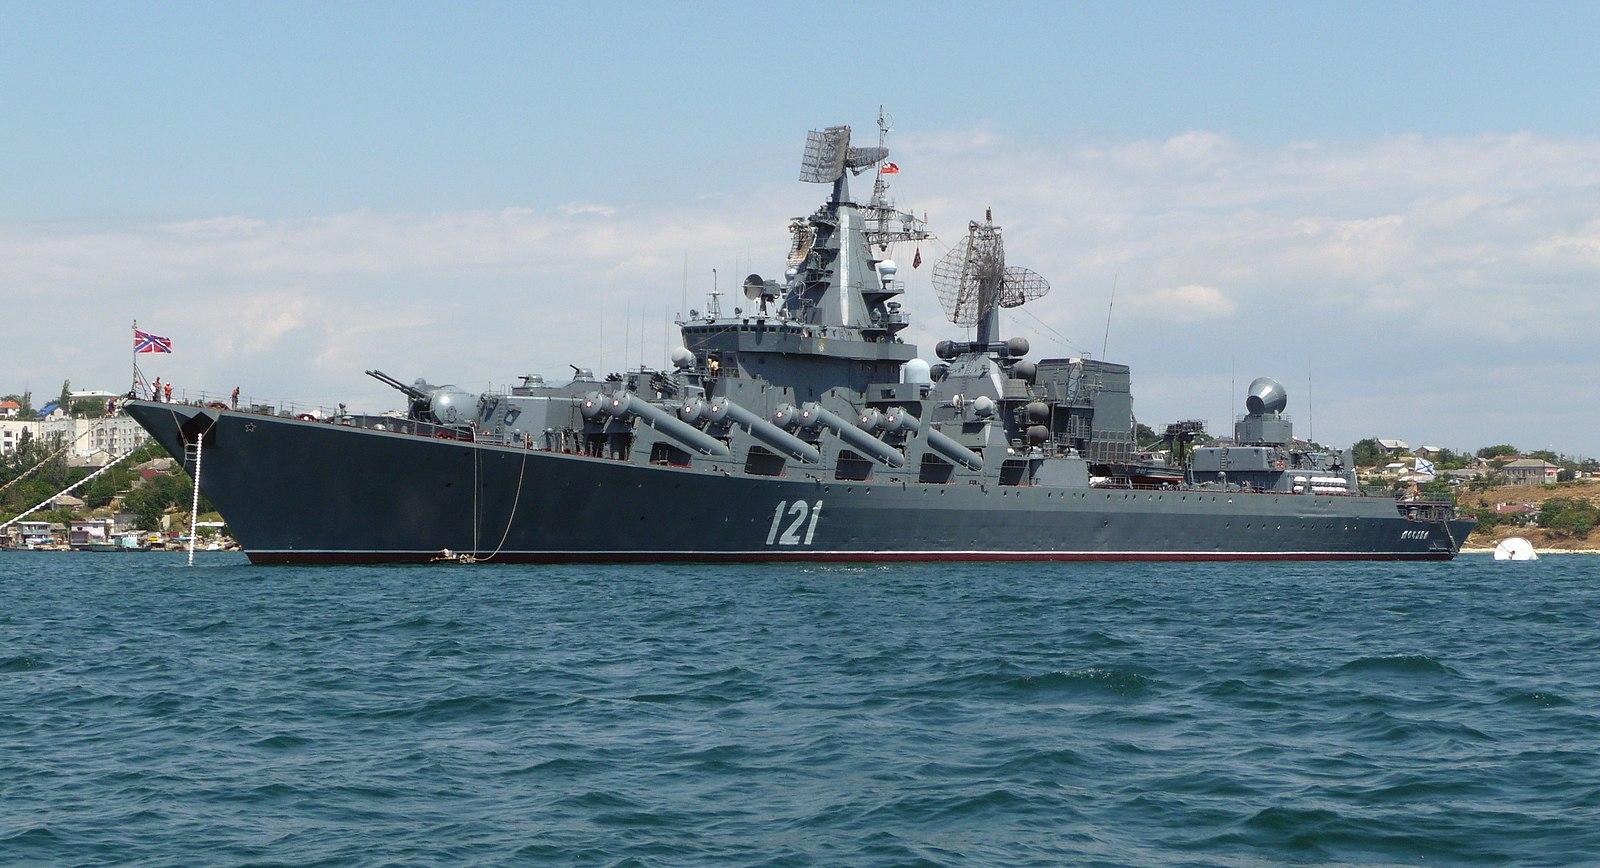 naval open source intelligence  russia sends a detachment